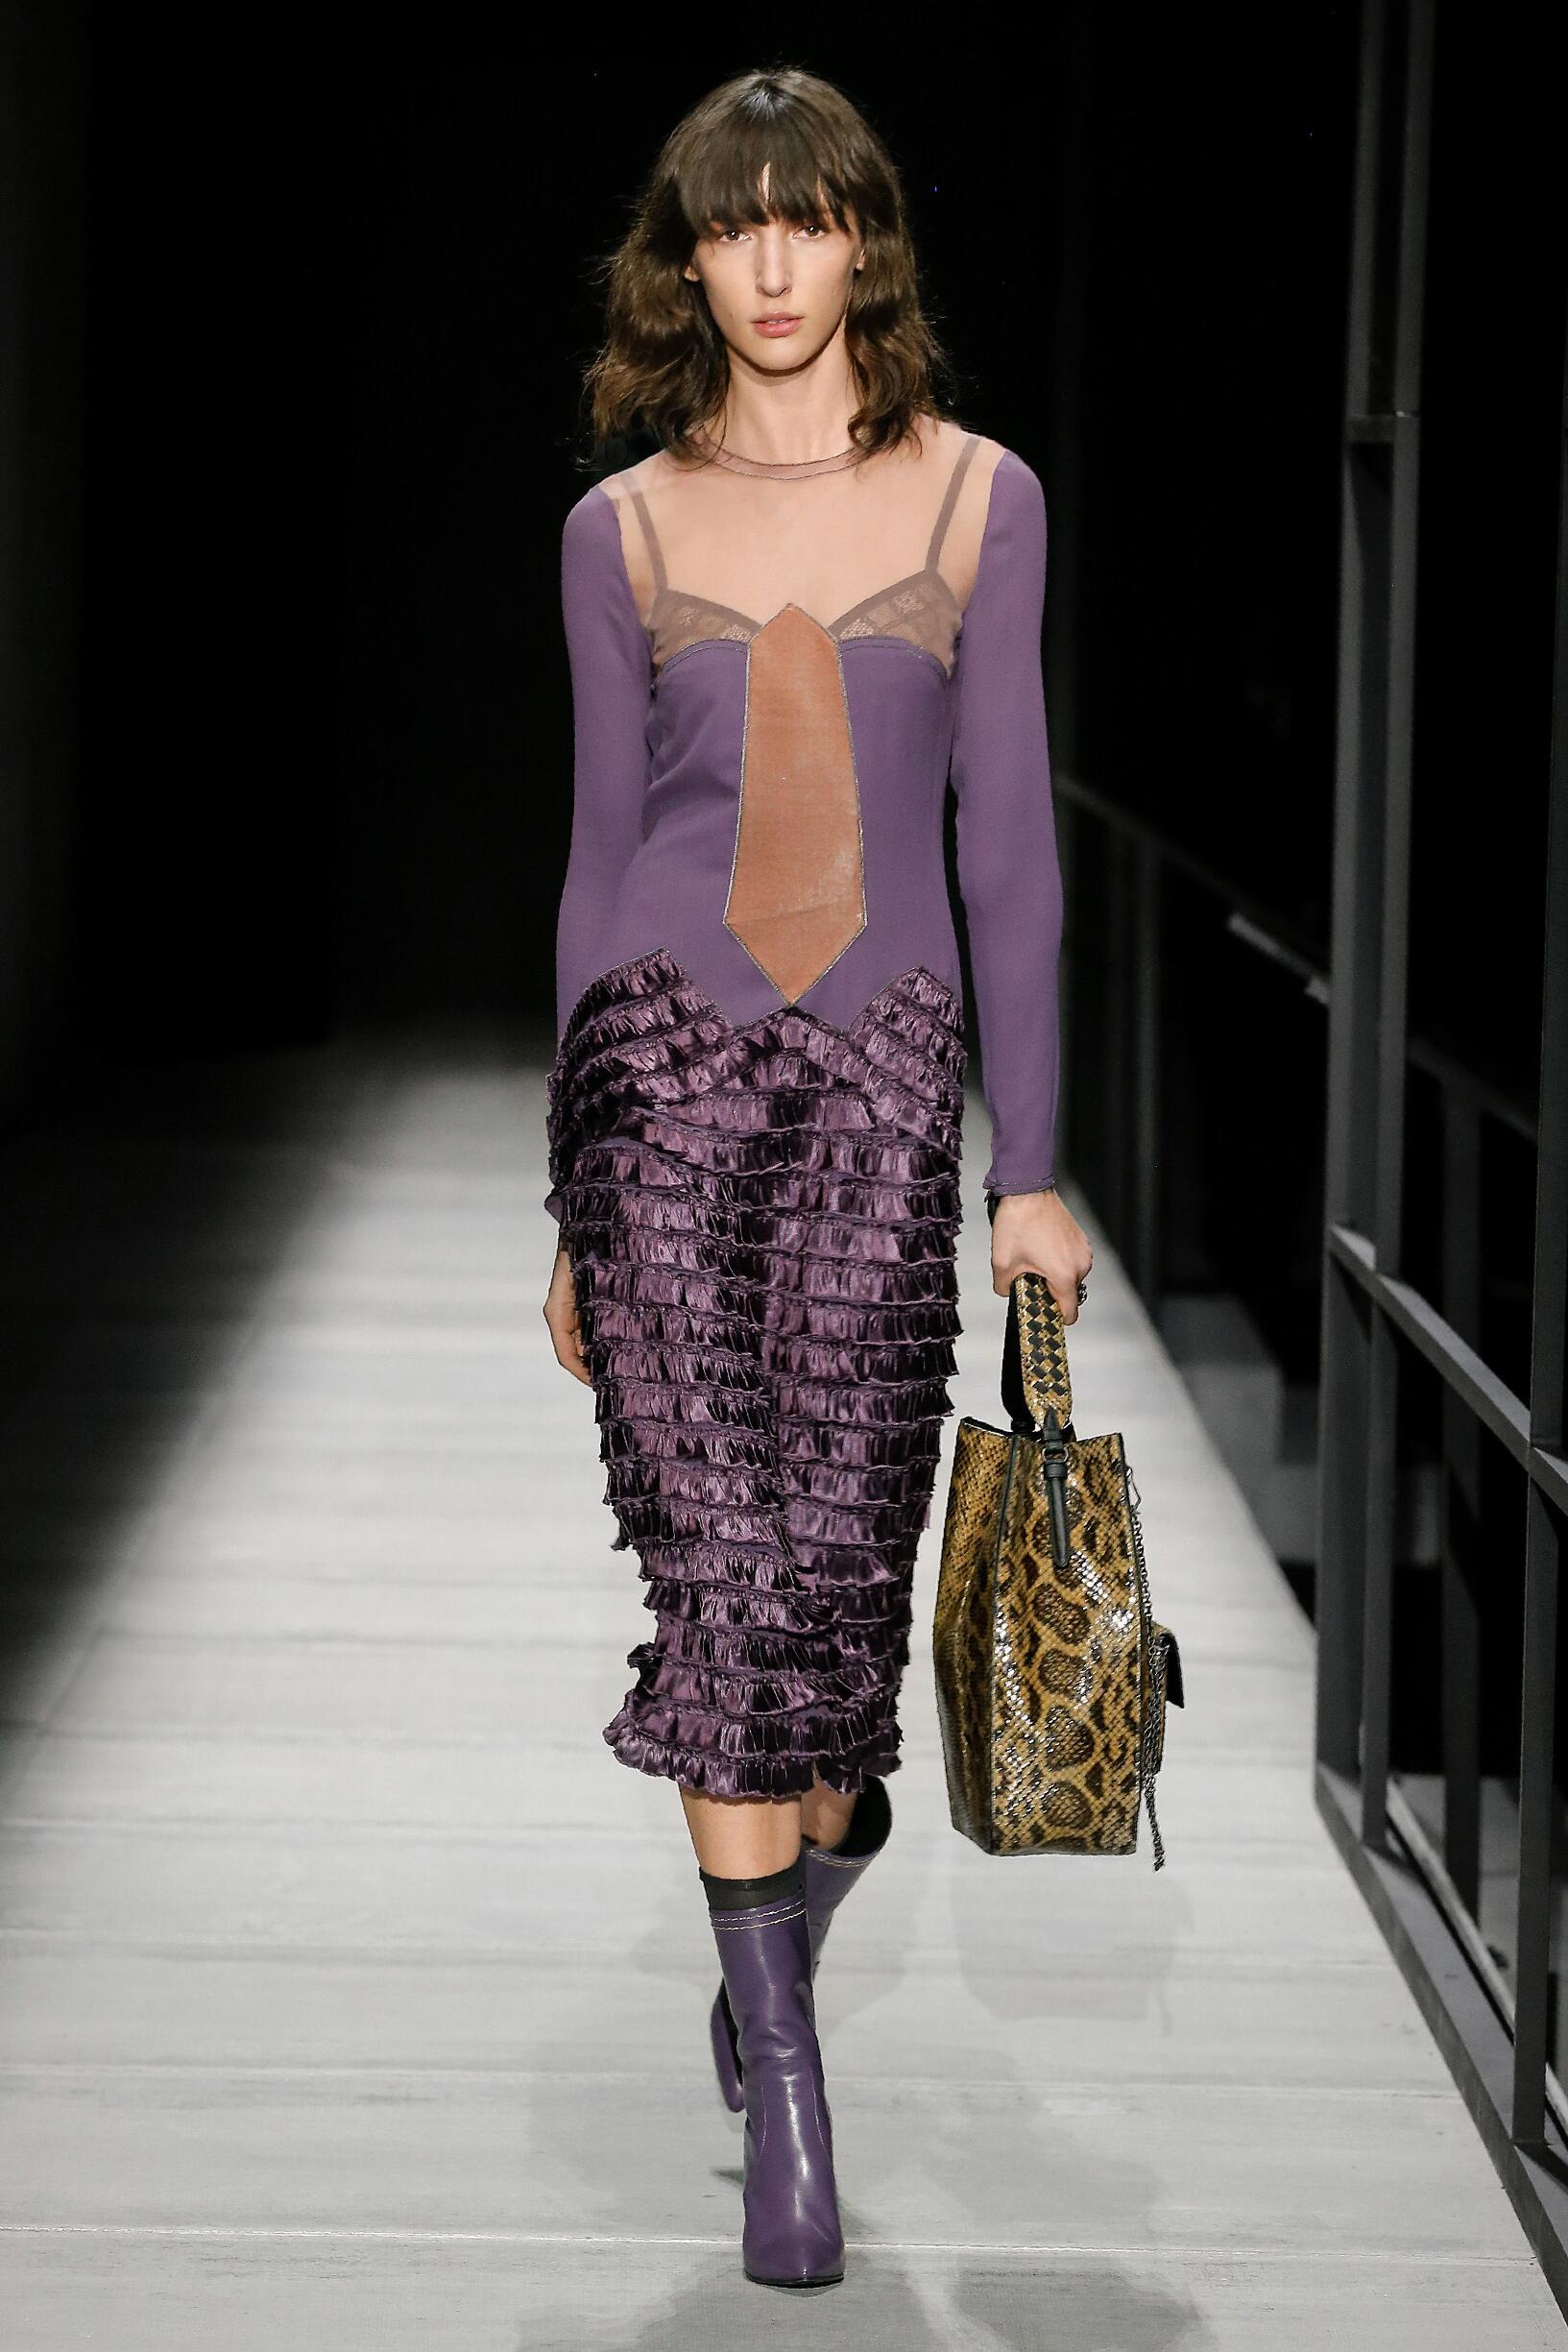 Bottega Veneta Womenswear New York Fashion Week